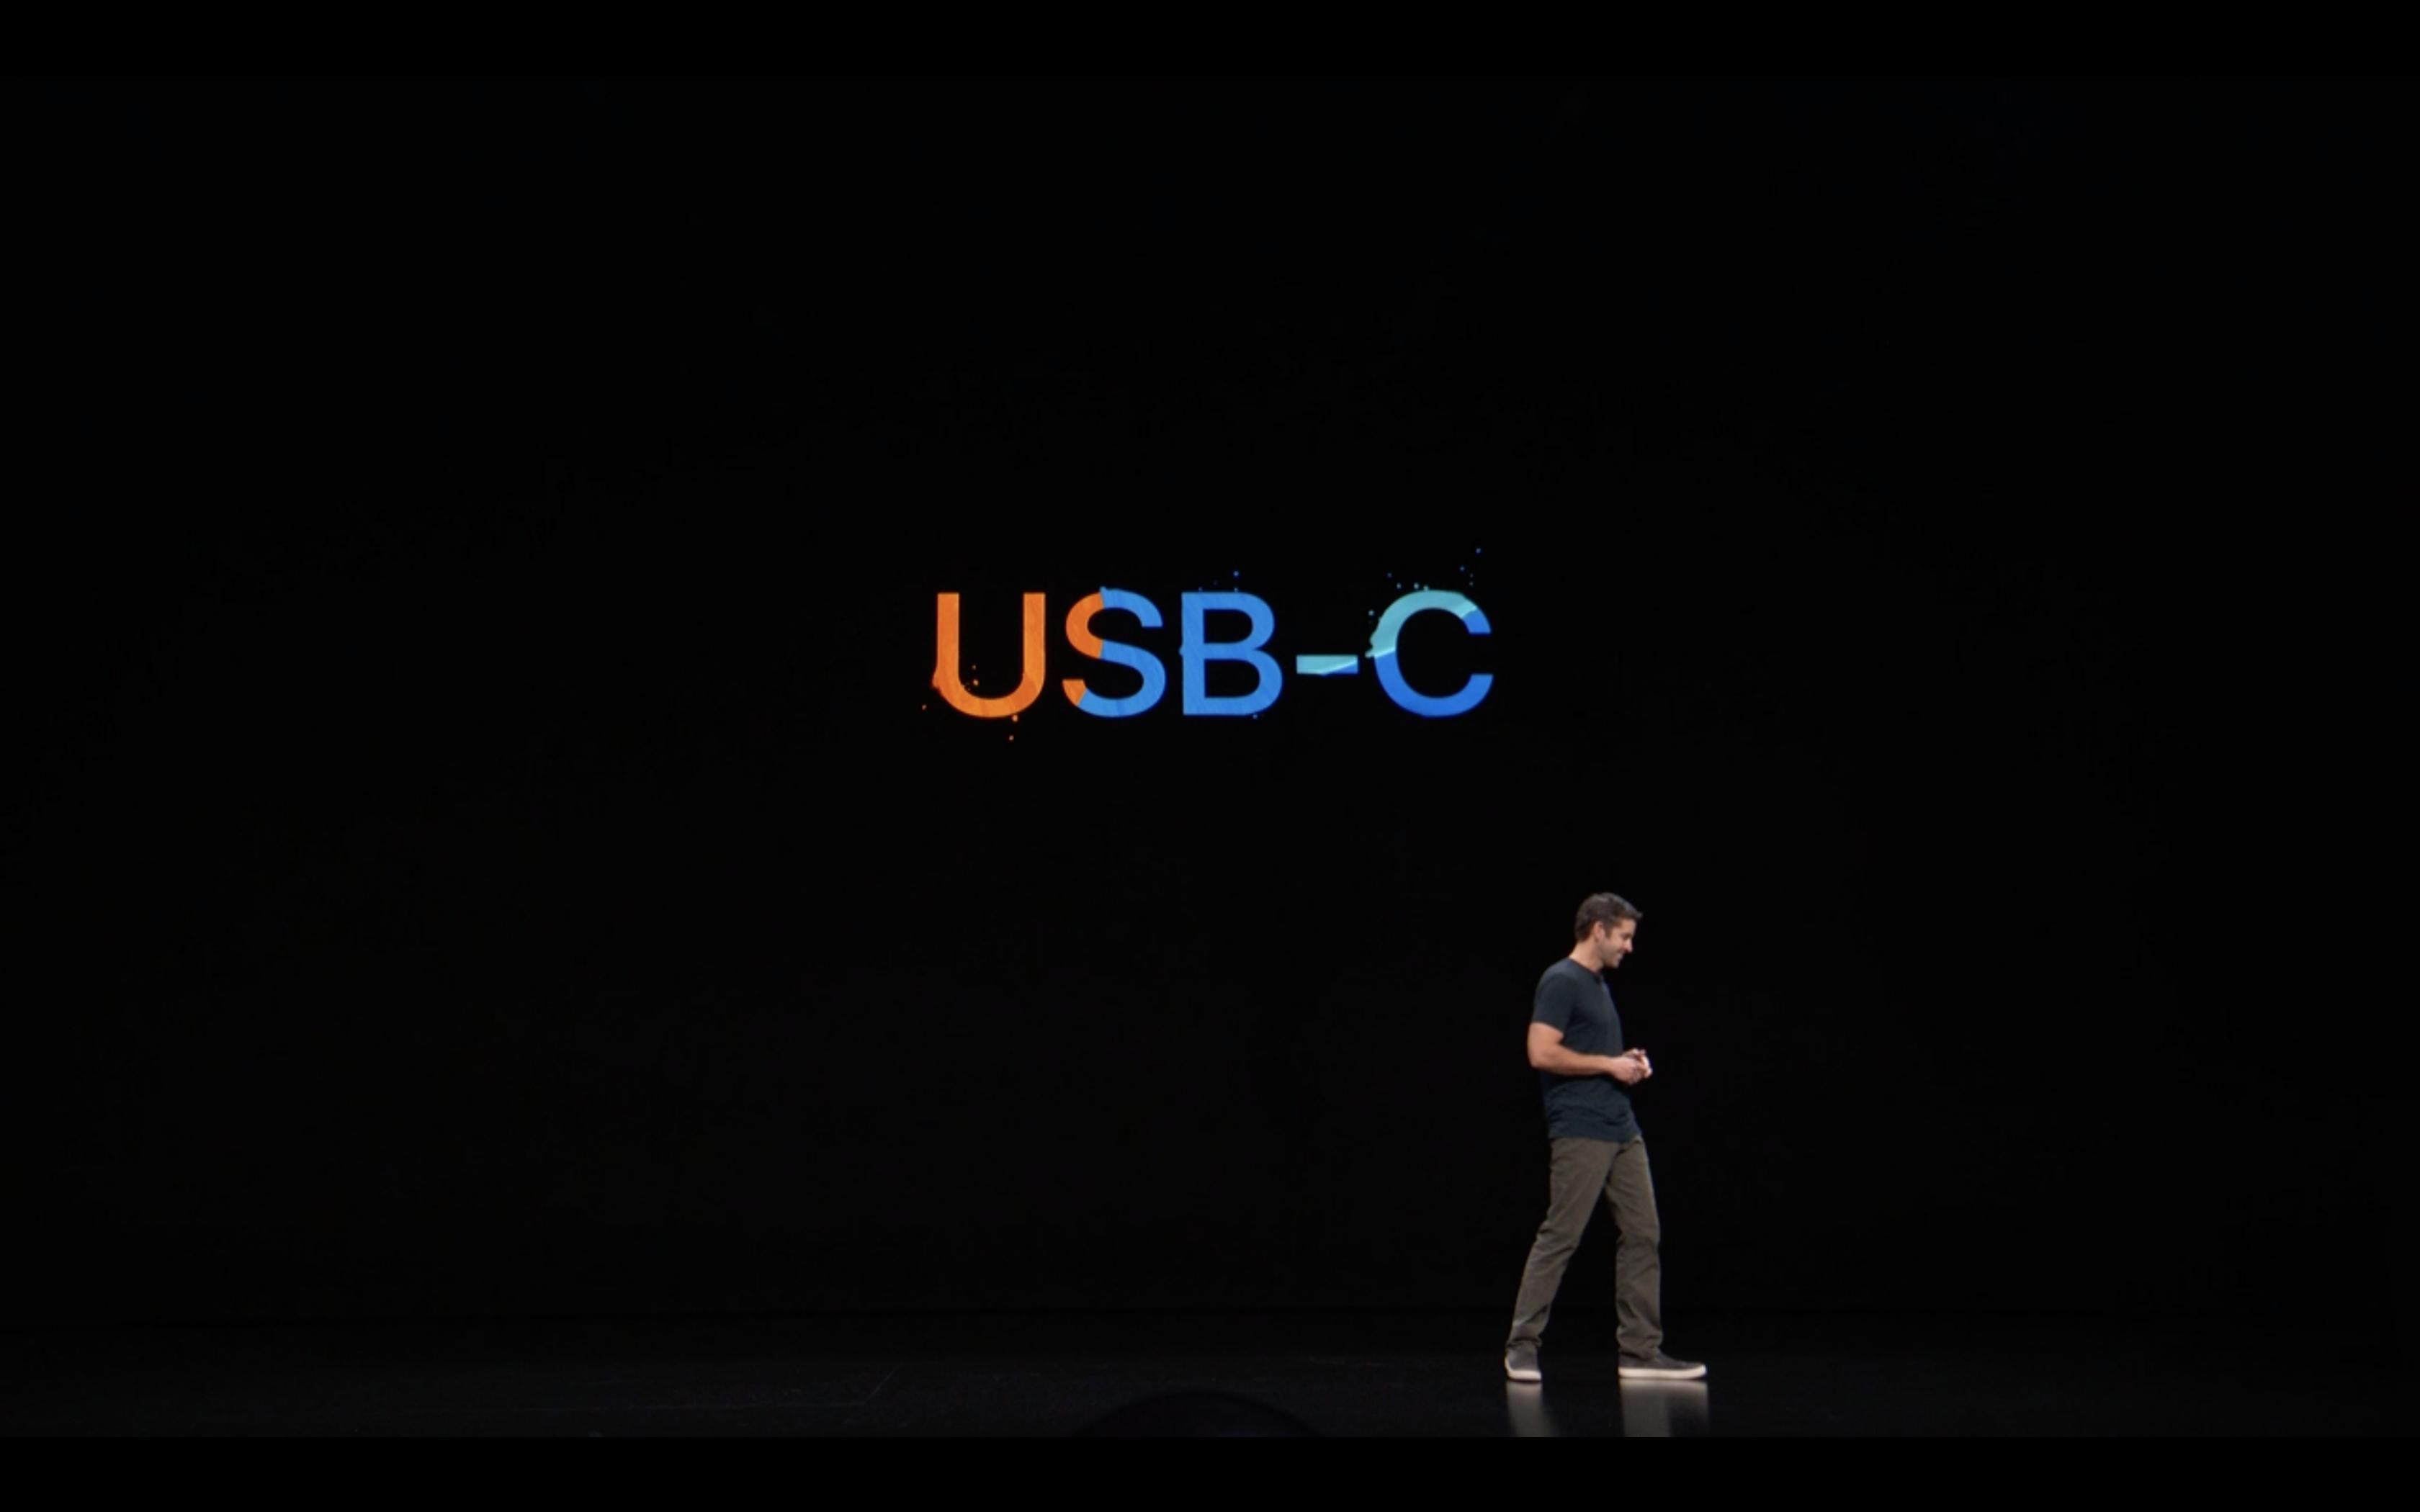 Apple Special Event - iPad - USB-C